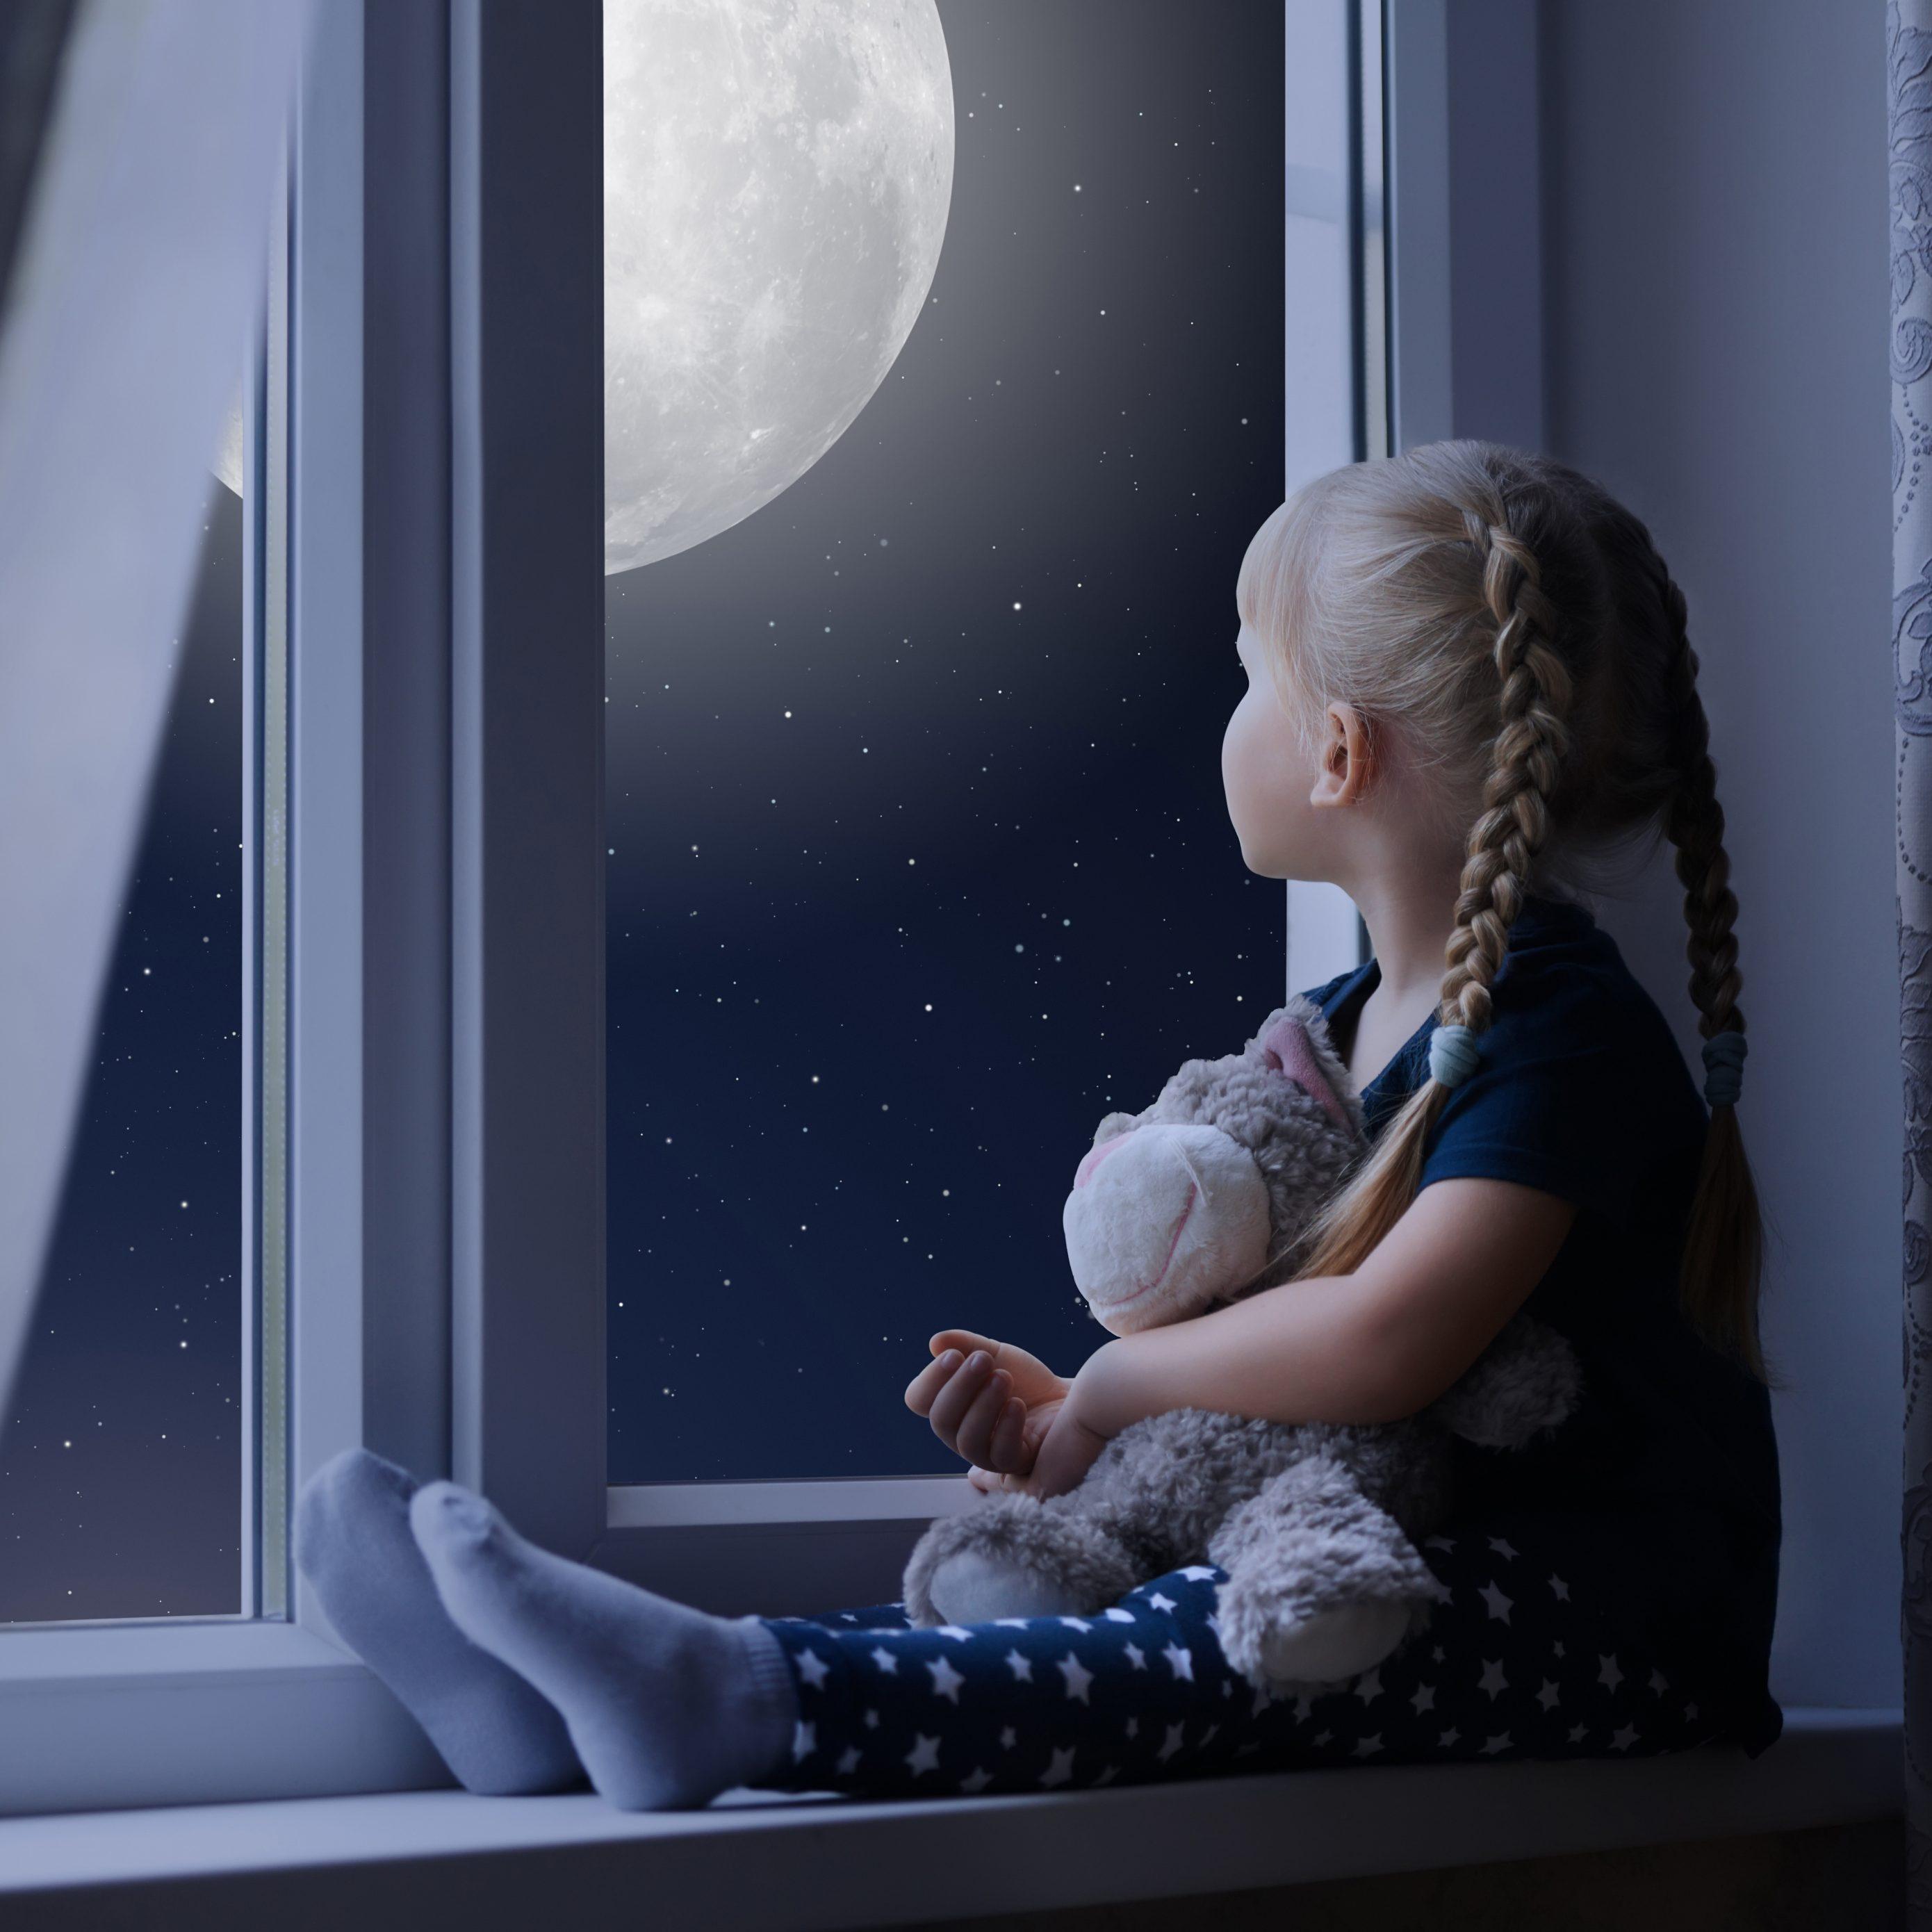 Little Girl Sad Window Teddybear Night Moon 8k Wallpaper Best